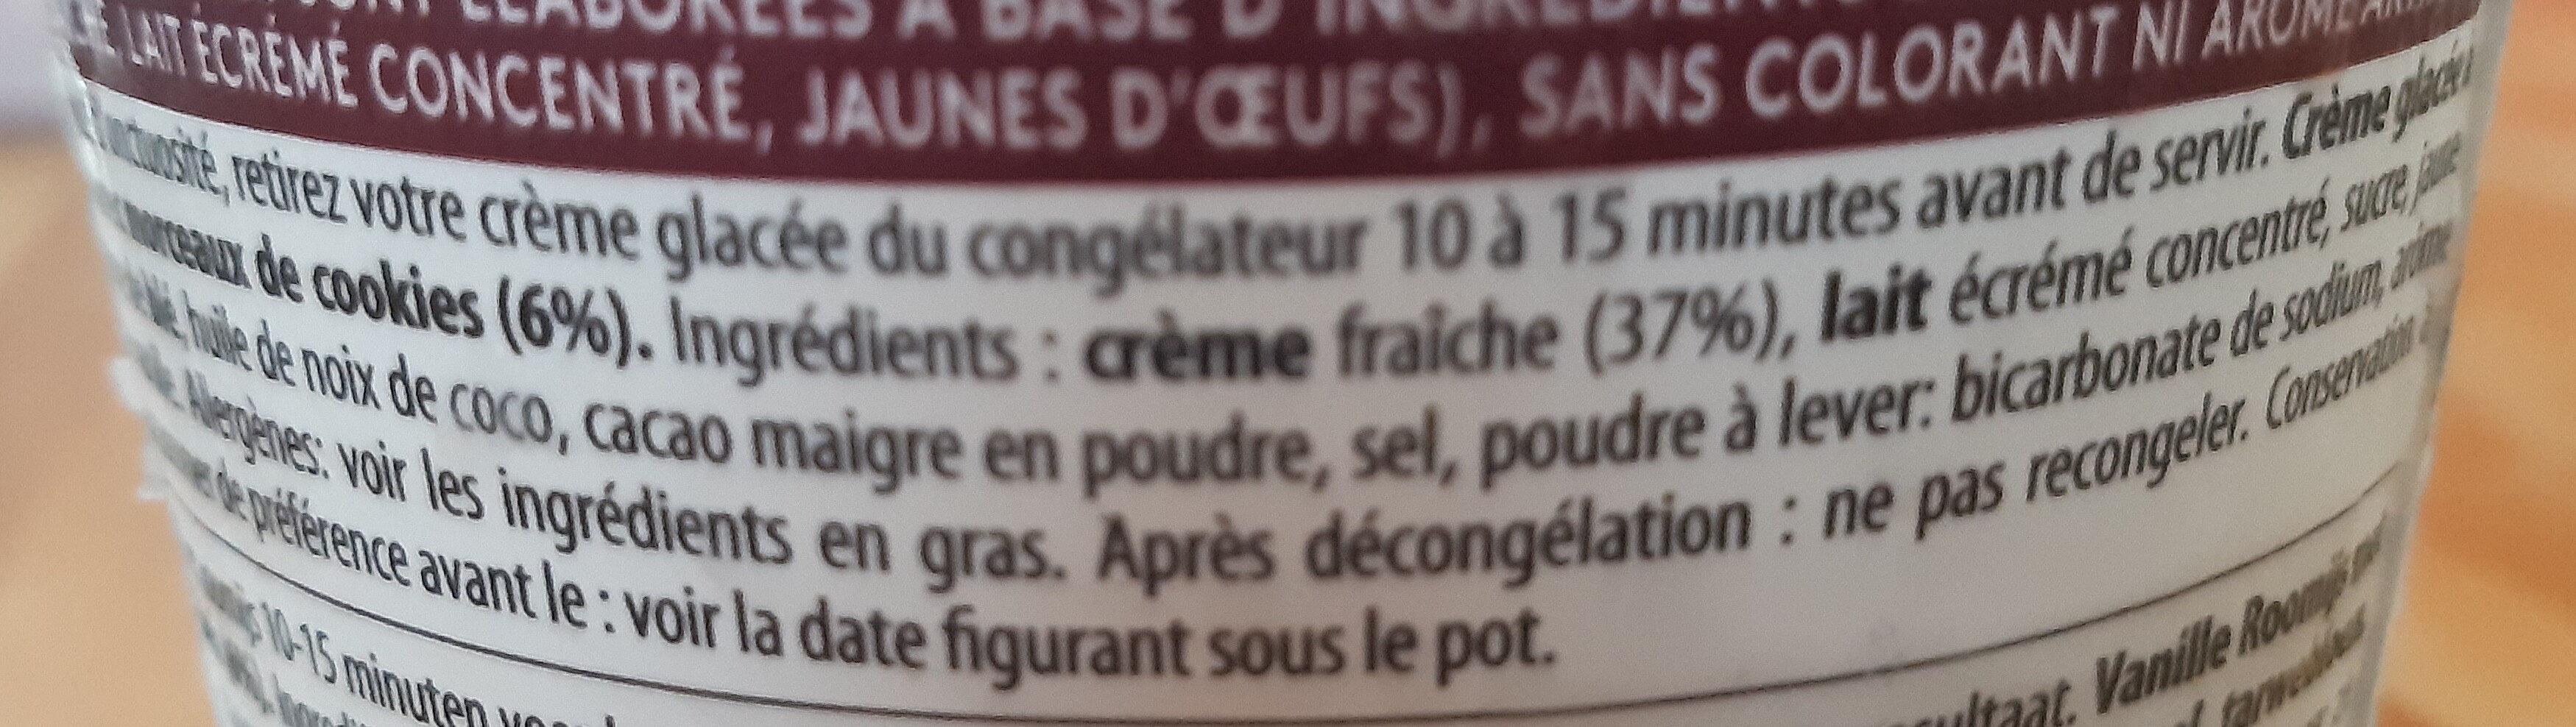 Crème glacée cookies & cream - Ingrediënten - fr